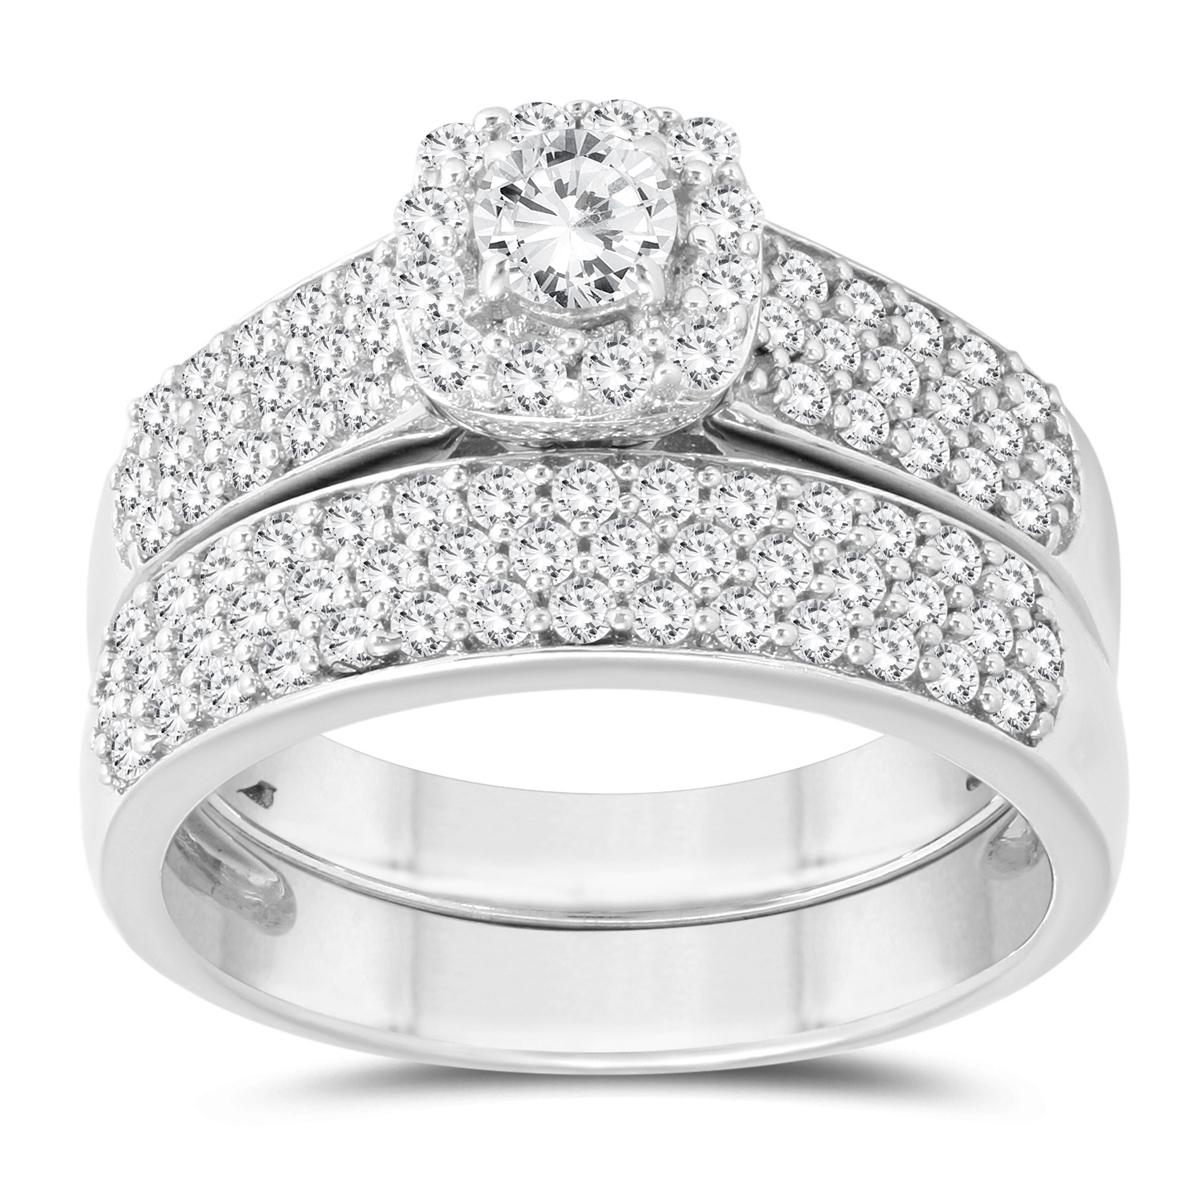 1 1/4 Carat TW Diamond Bridal Set in 10K White Gold